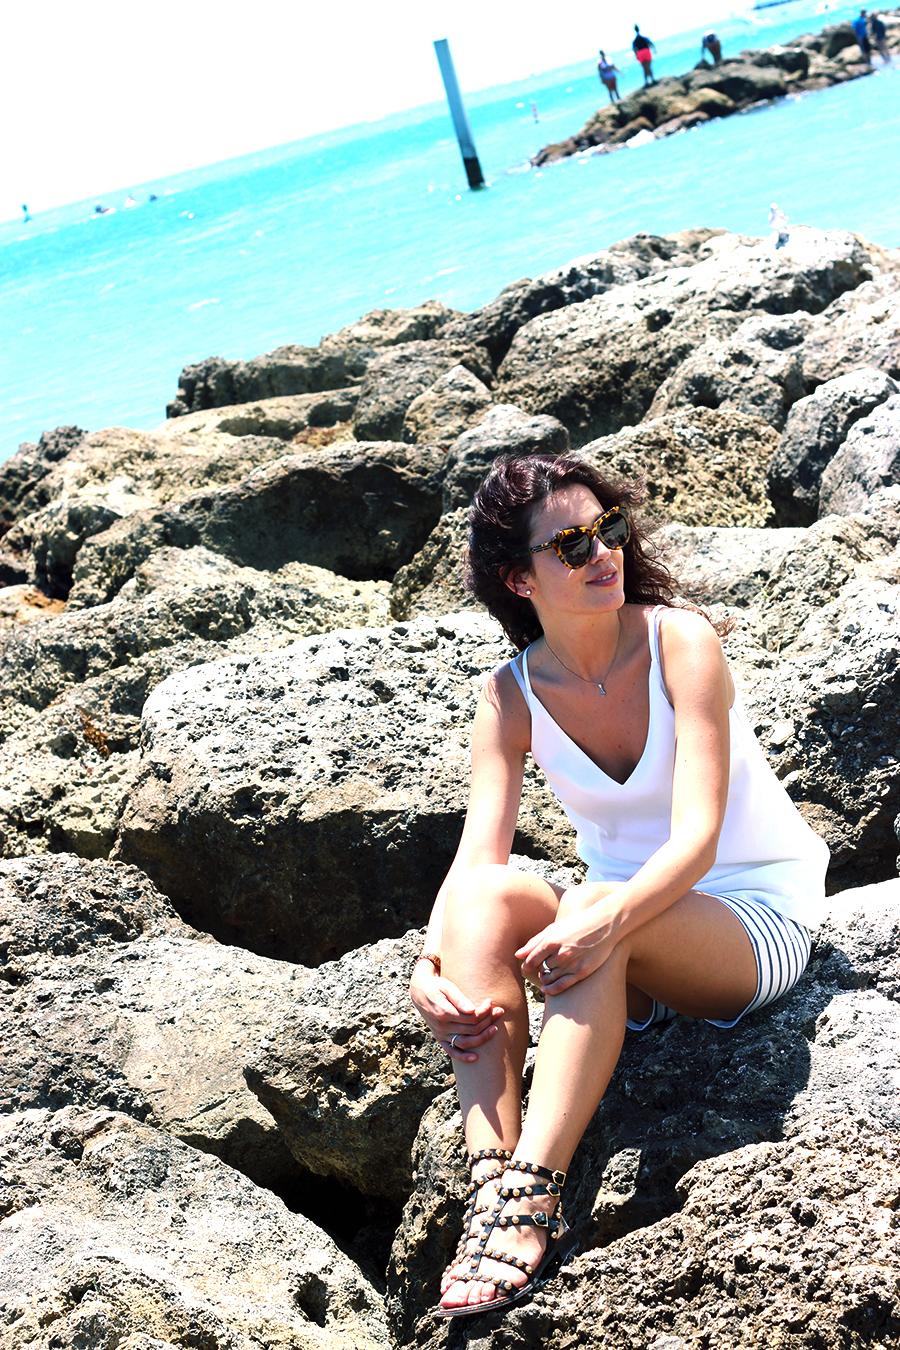 oasis-white-cami-top